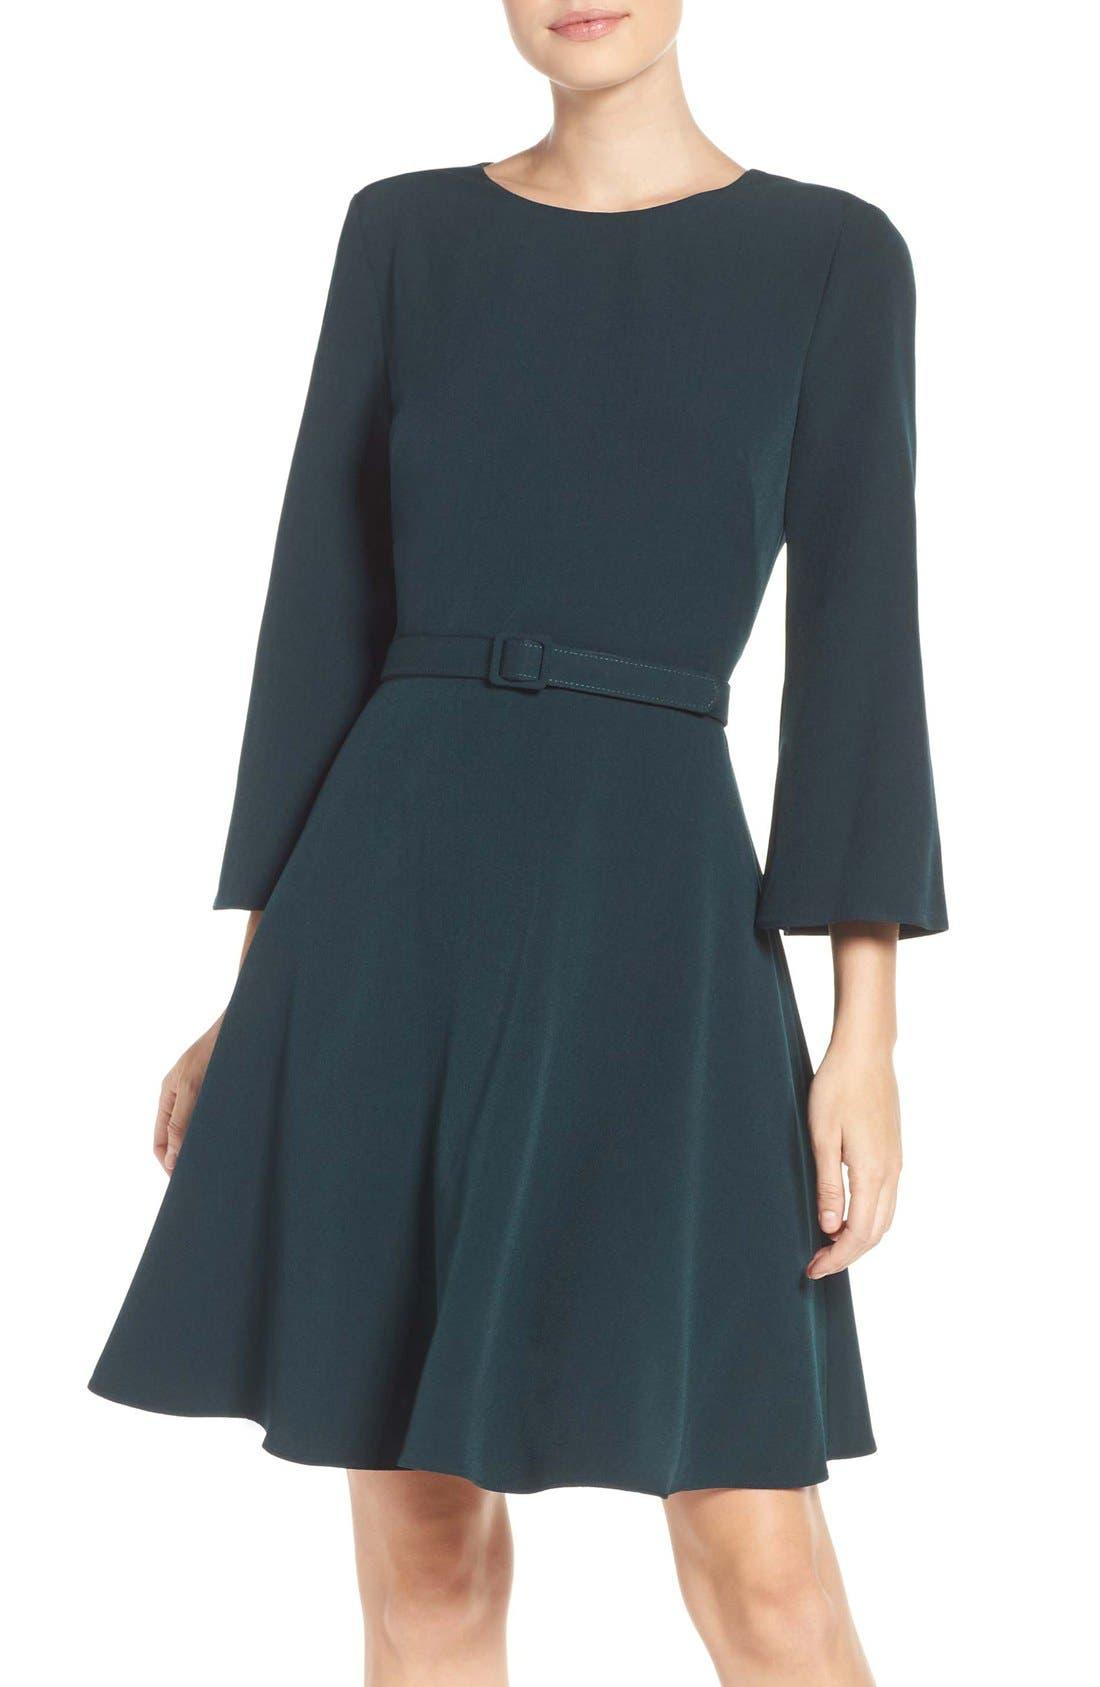 Alternate Image 1 Selected - Eliza J Crepe Fit & Flare Dress (Regular & Petite)